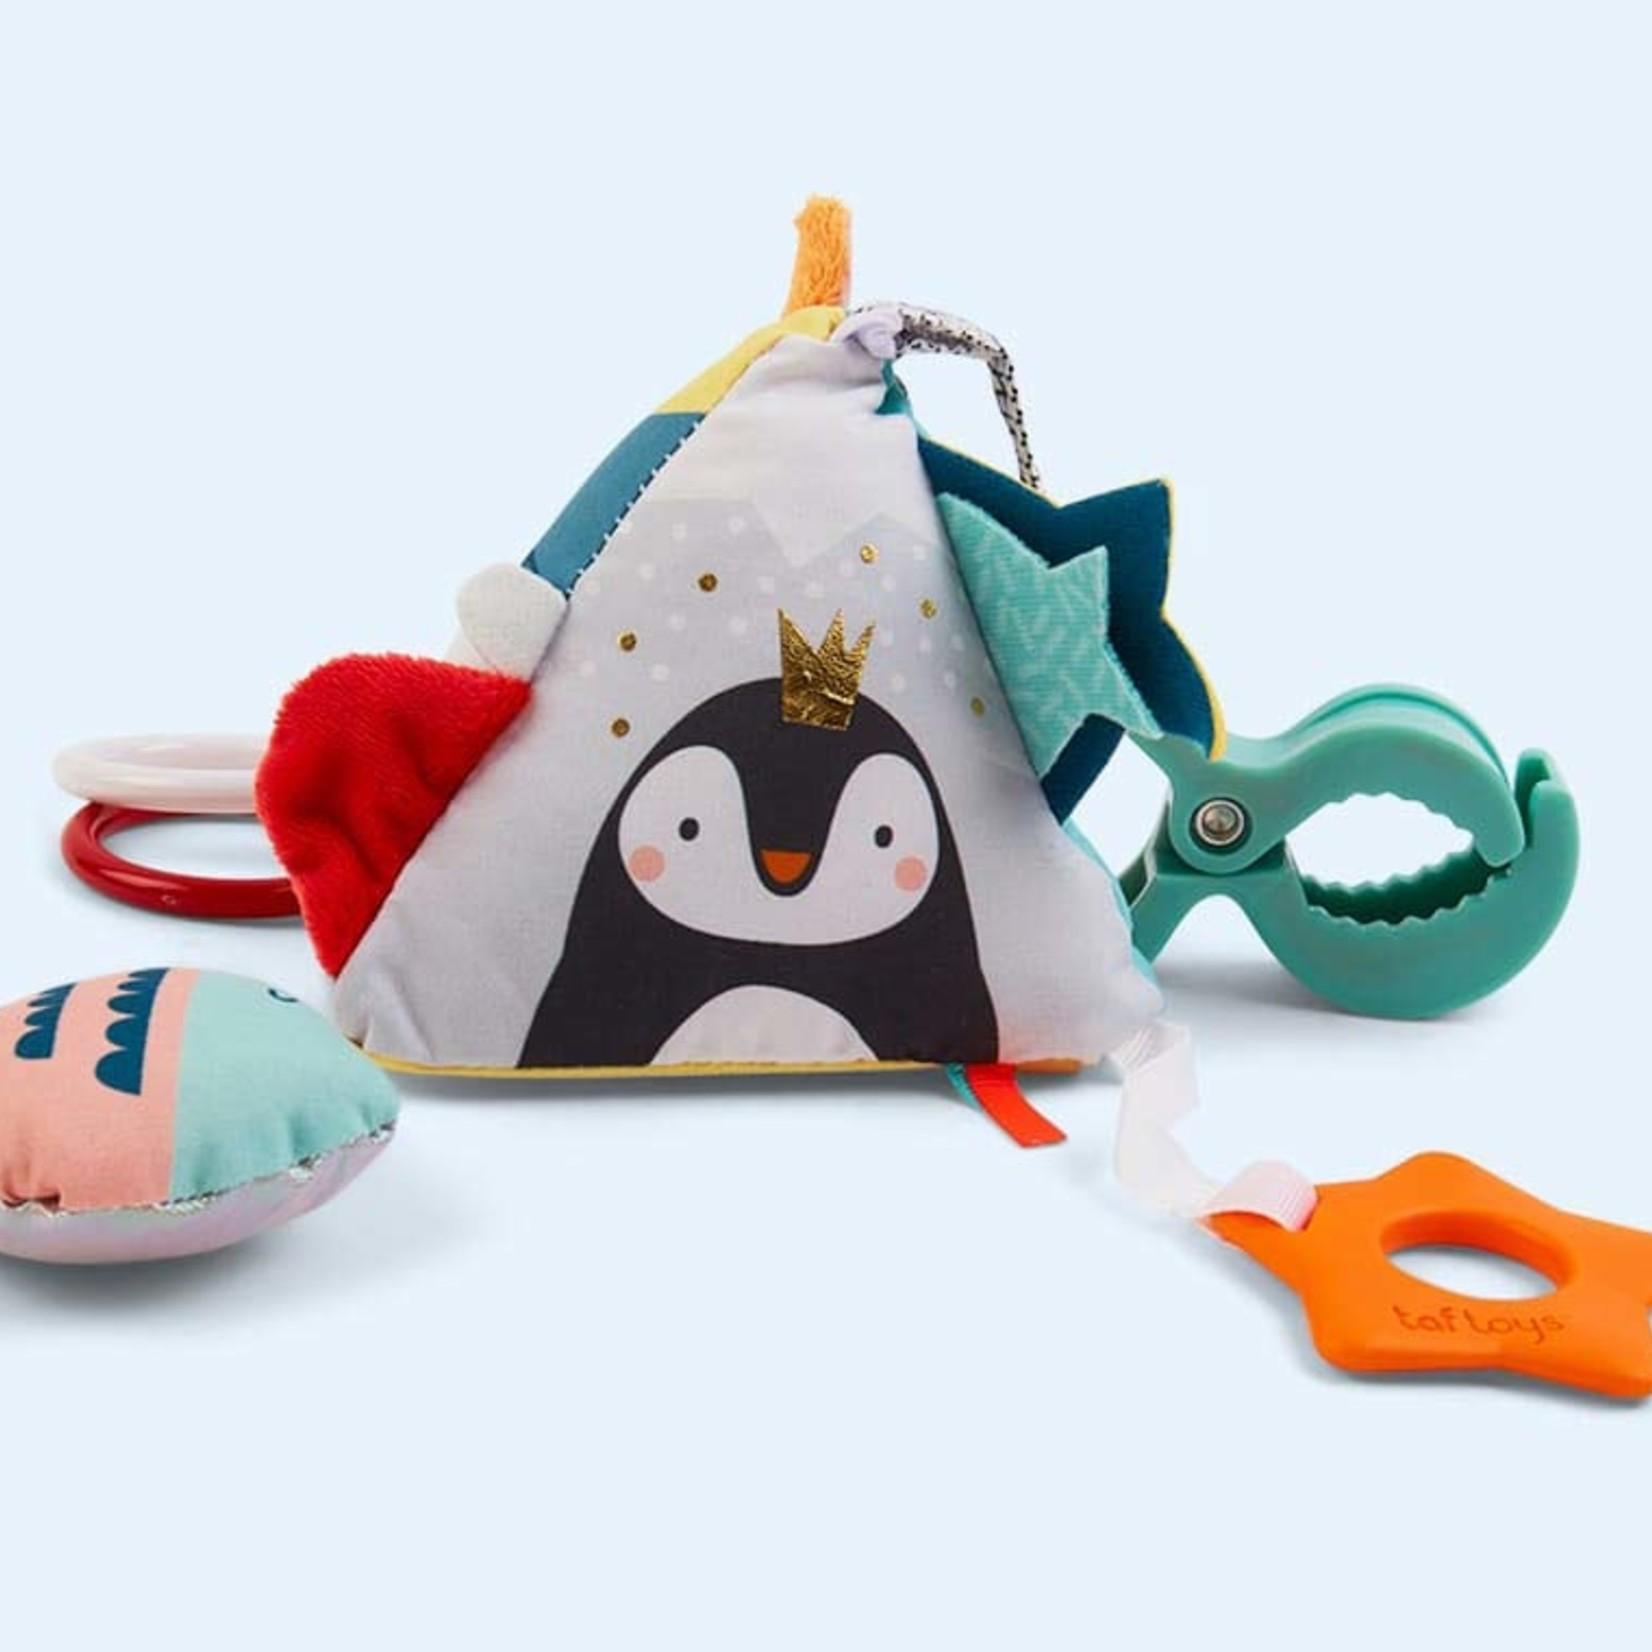 Taf Toys Taf Toys North Pole Pyramid